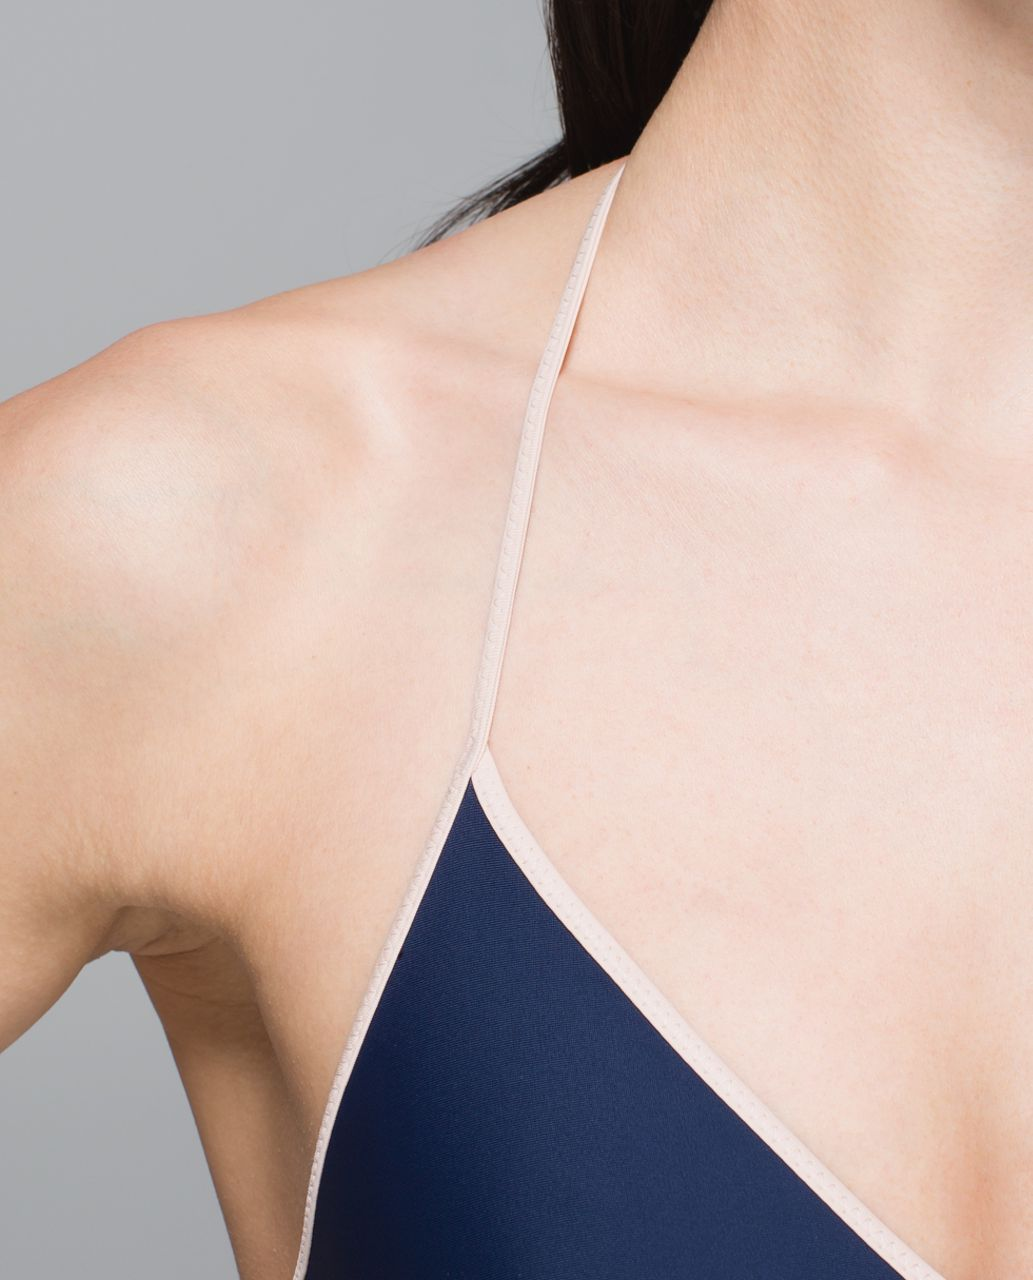 Lululemon Water:  Surf To Sand Tie Top - Naval Blue / Naked / Plum